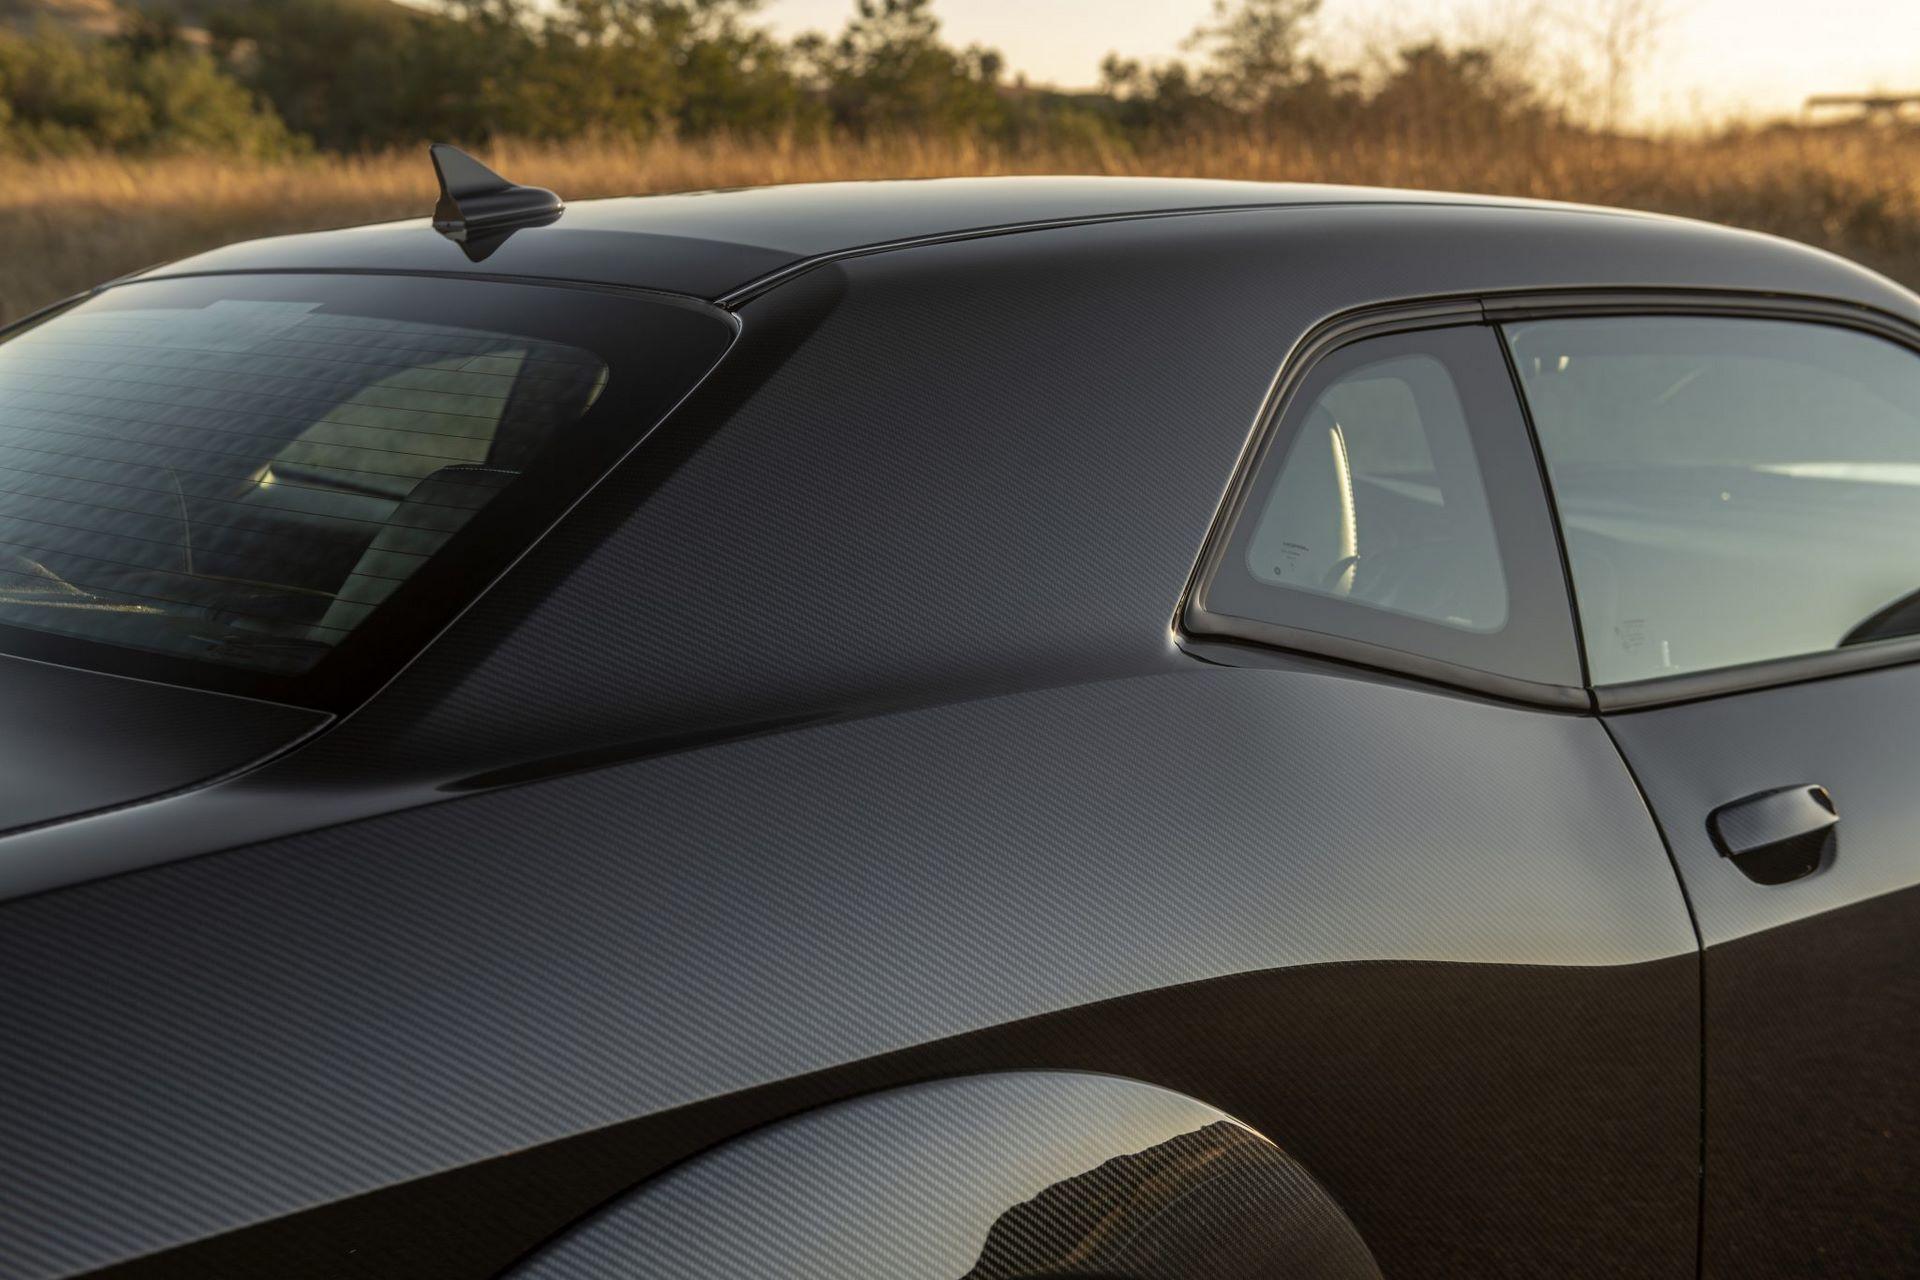 Dodge-Challenger-SRT-Demon-Carbon-by-Speedkore-10